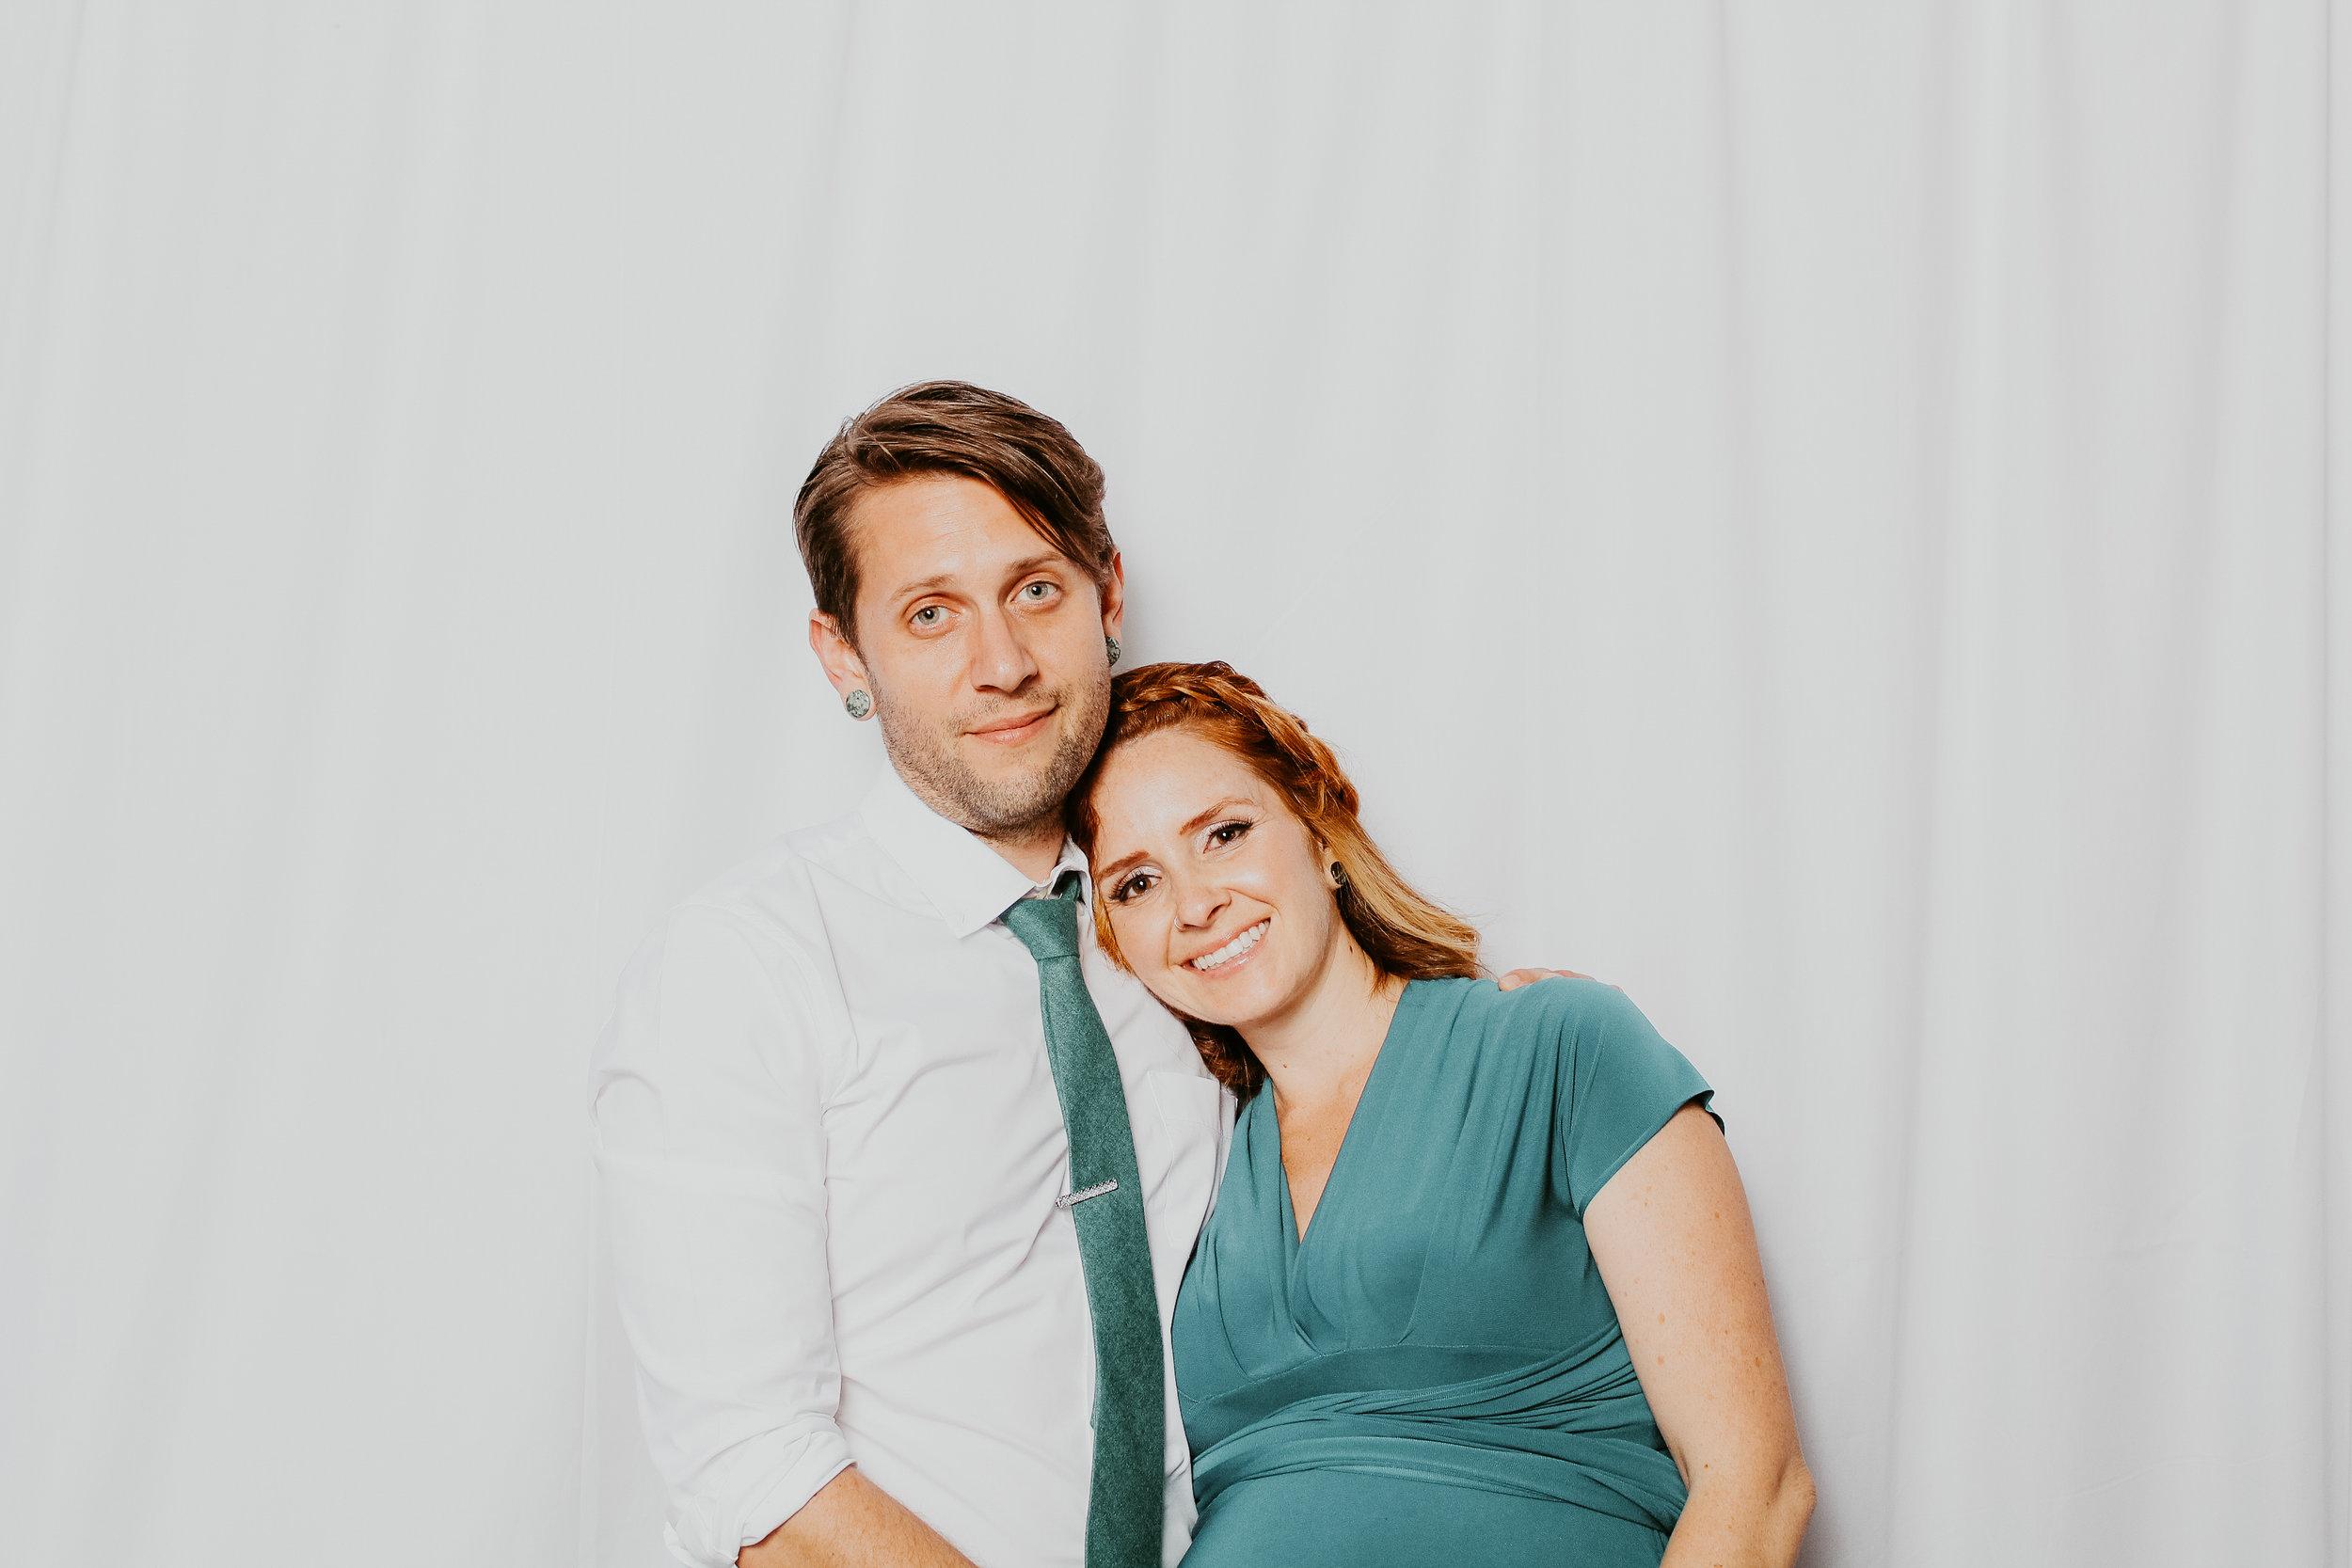 Trendy Wedding Photo Booth Rentals